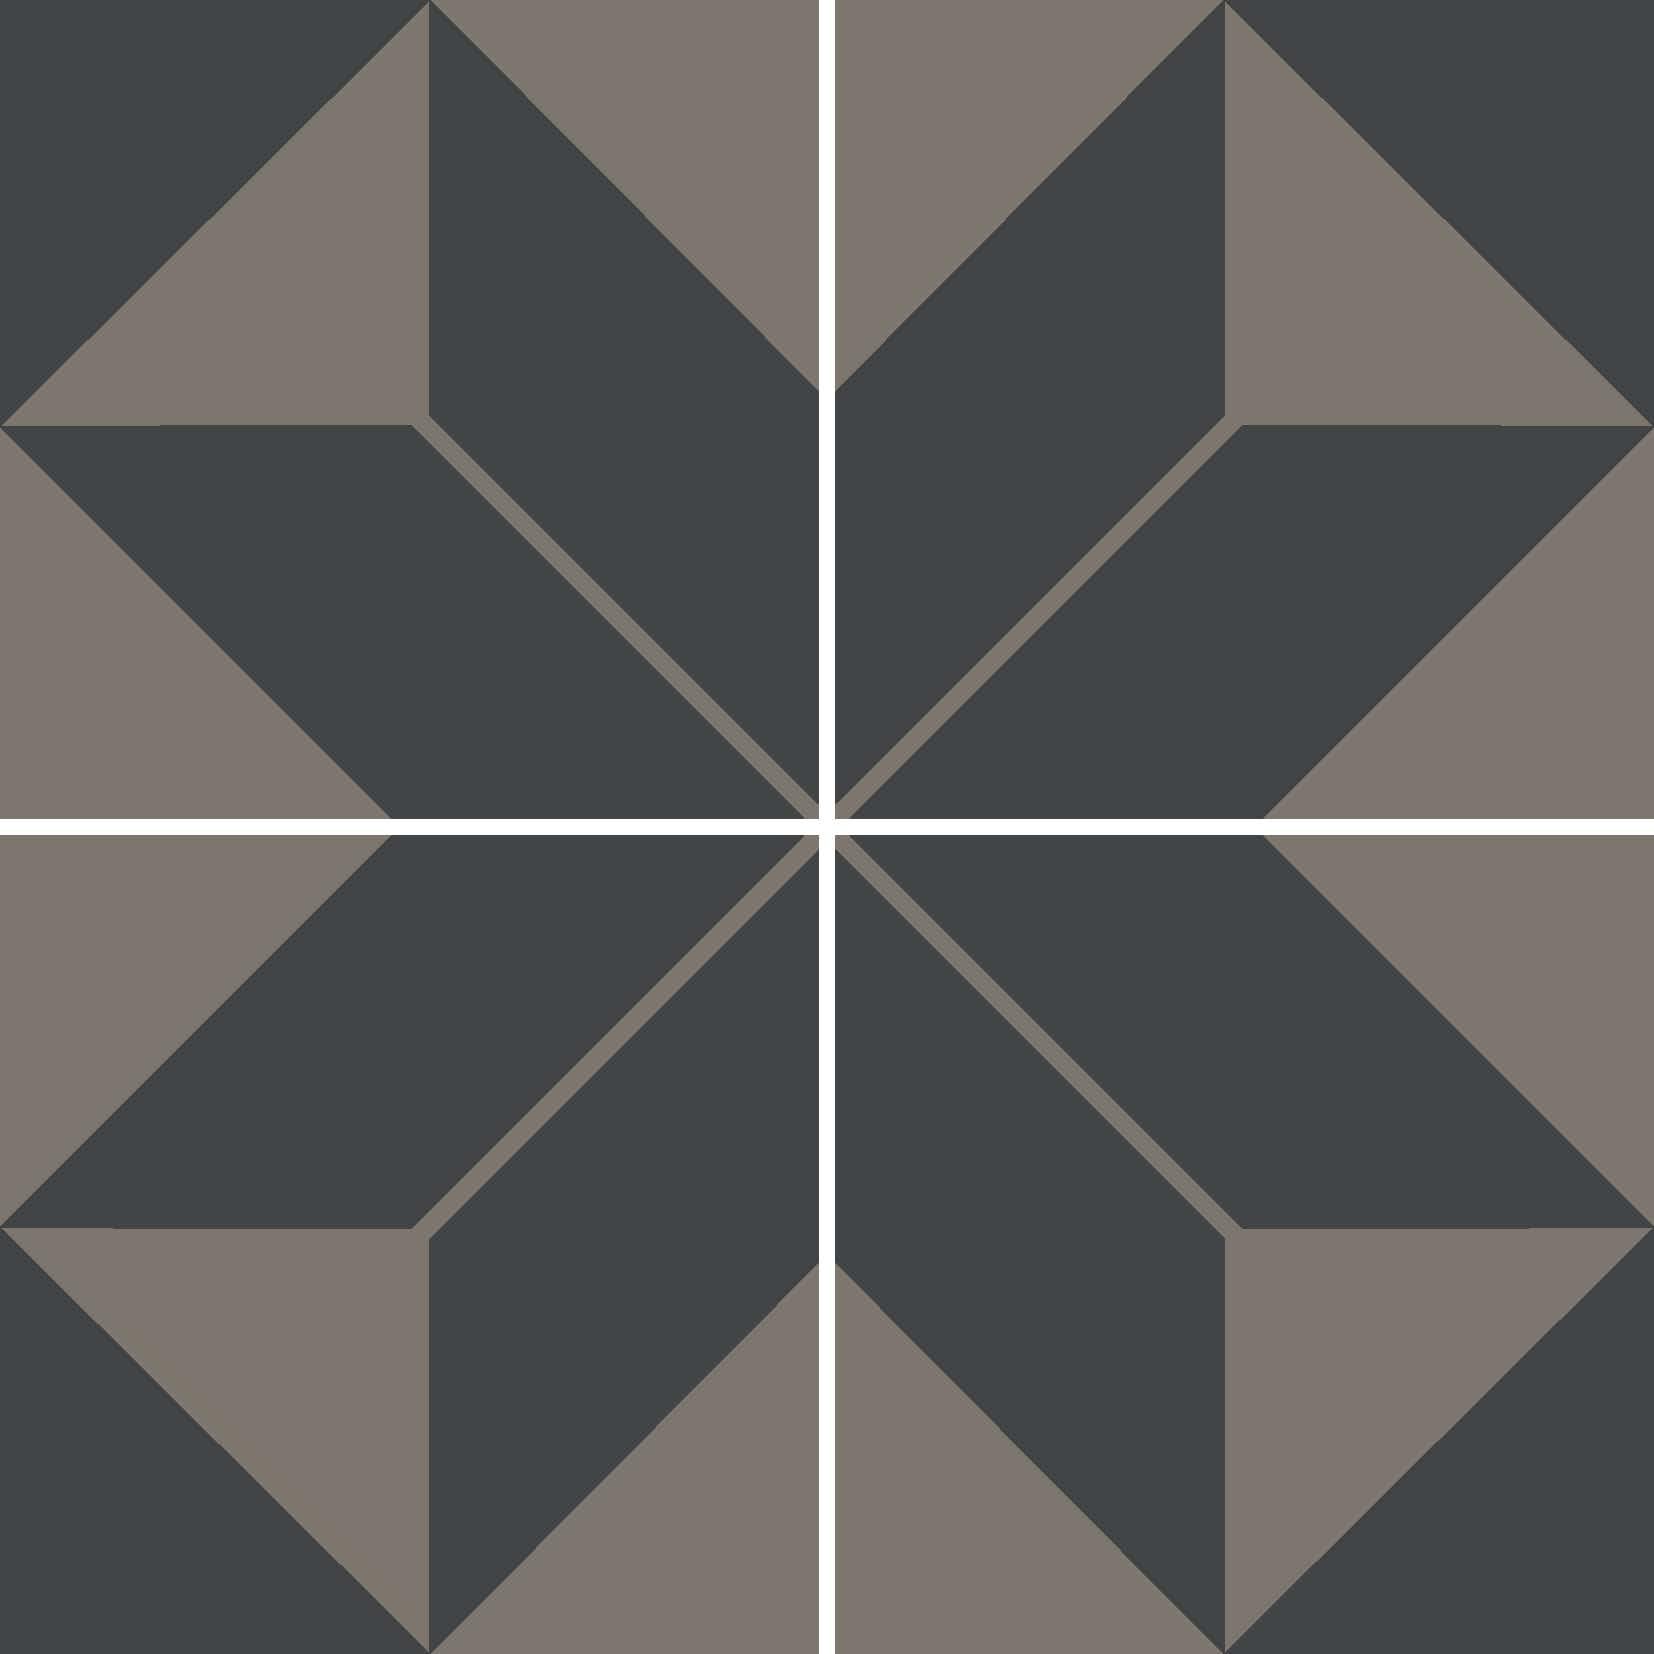 Edelweiss2 - Anthracite Noir.jpg